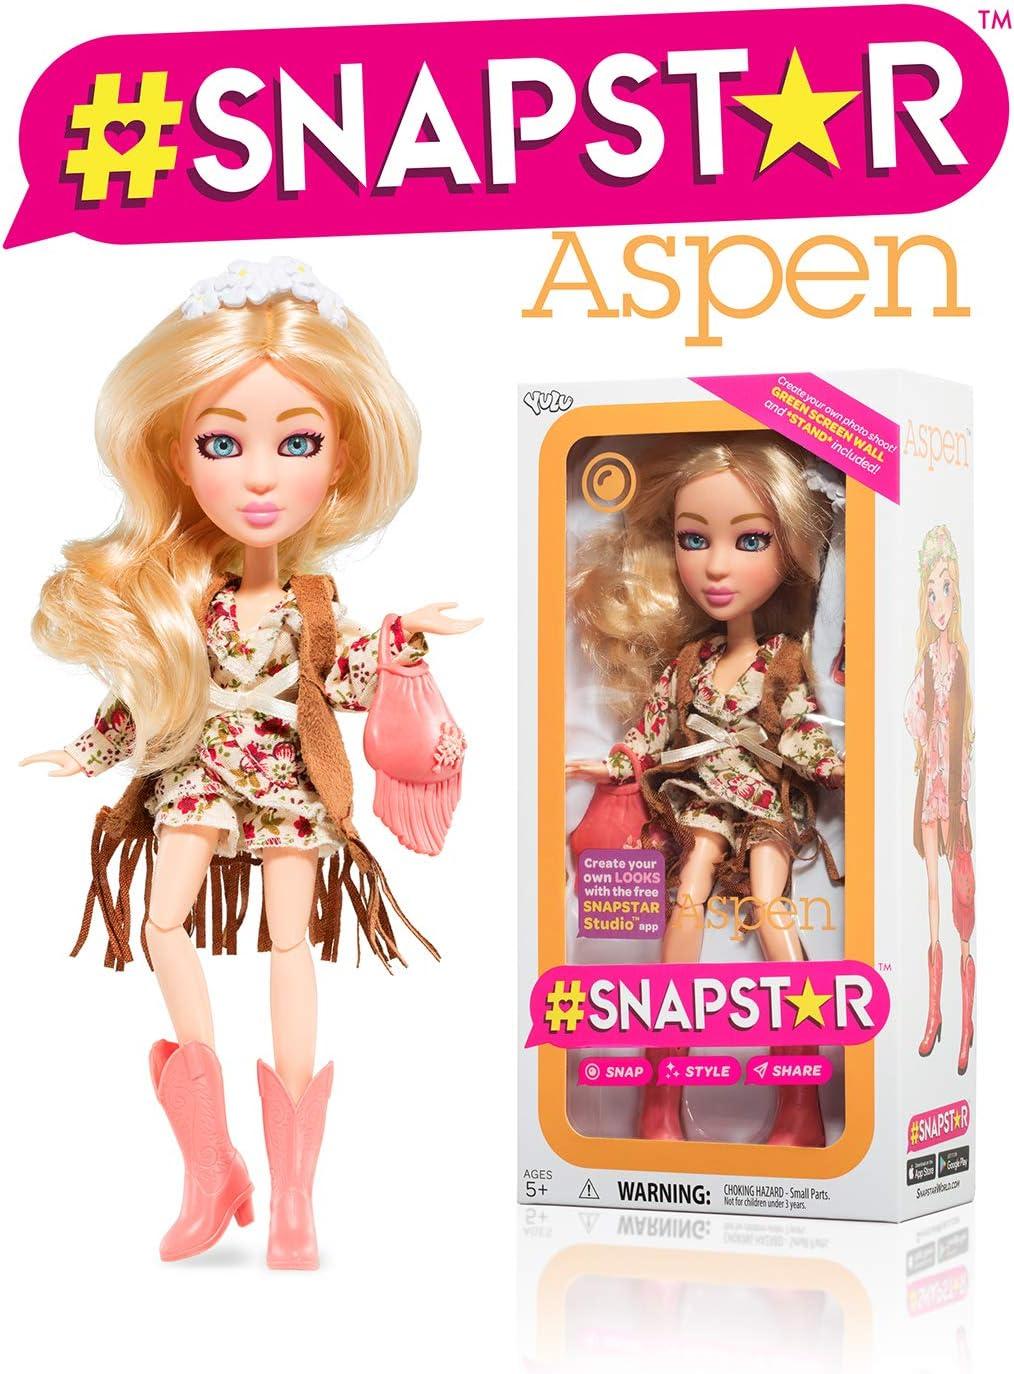 Yulu Toys Snapstar Aspen Fashion Doll 25cm: Amazon.fr: Jeux et Jouets